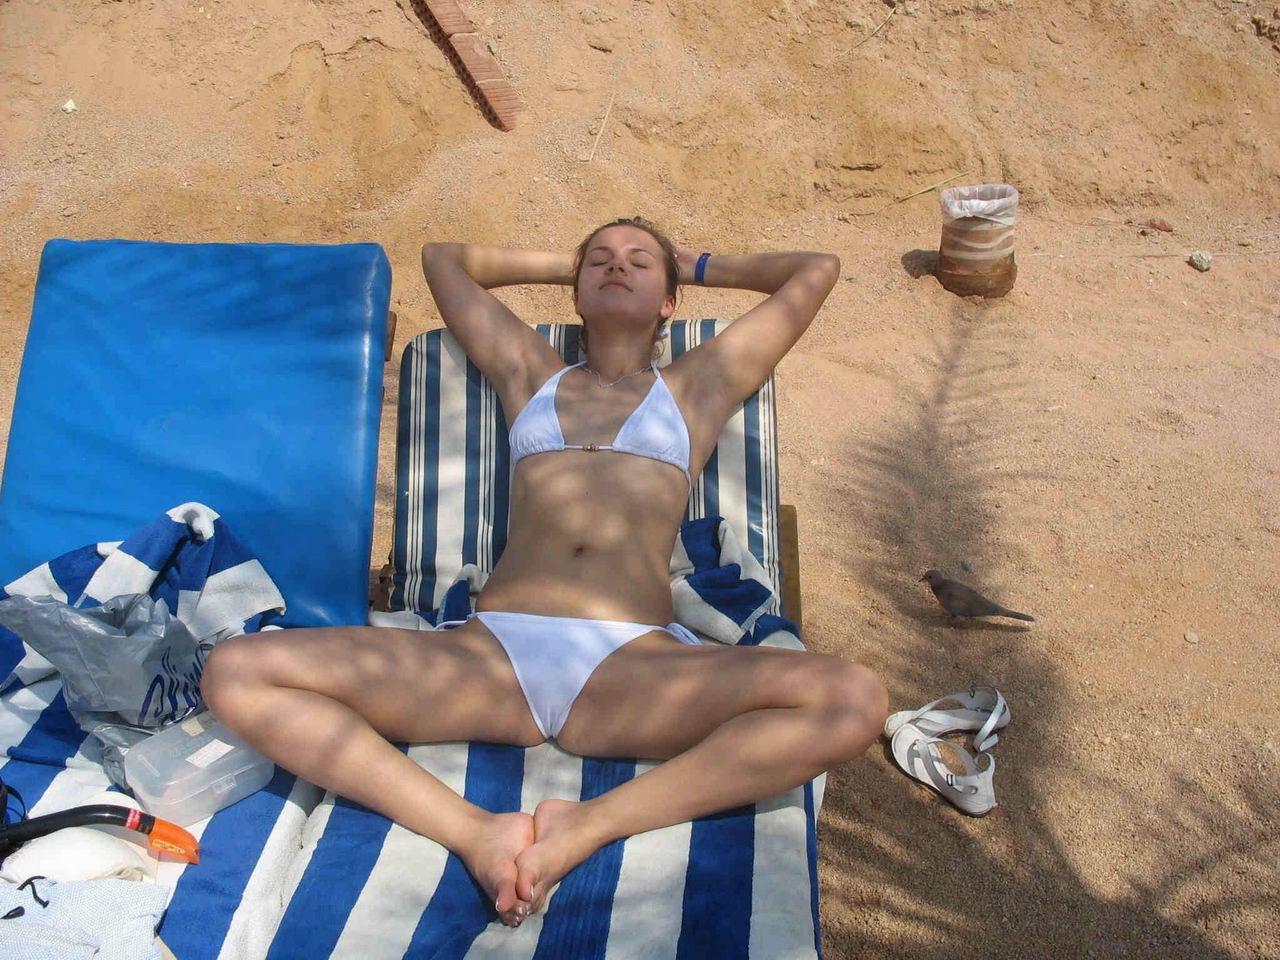 Немного солнца и бикини - 34 (50 фото)